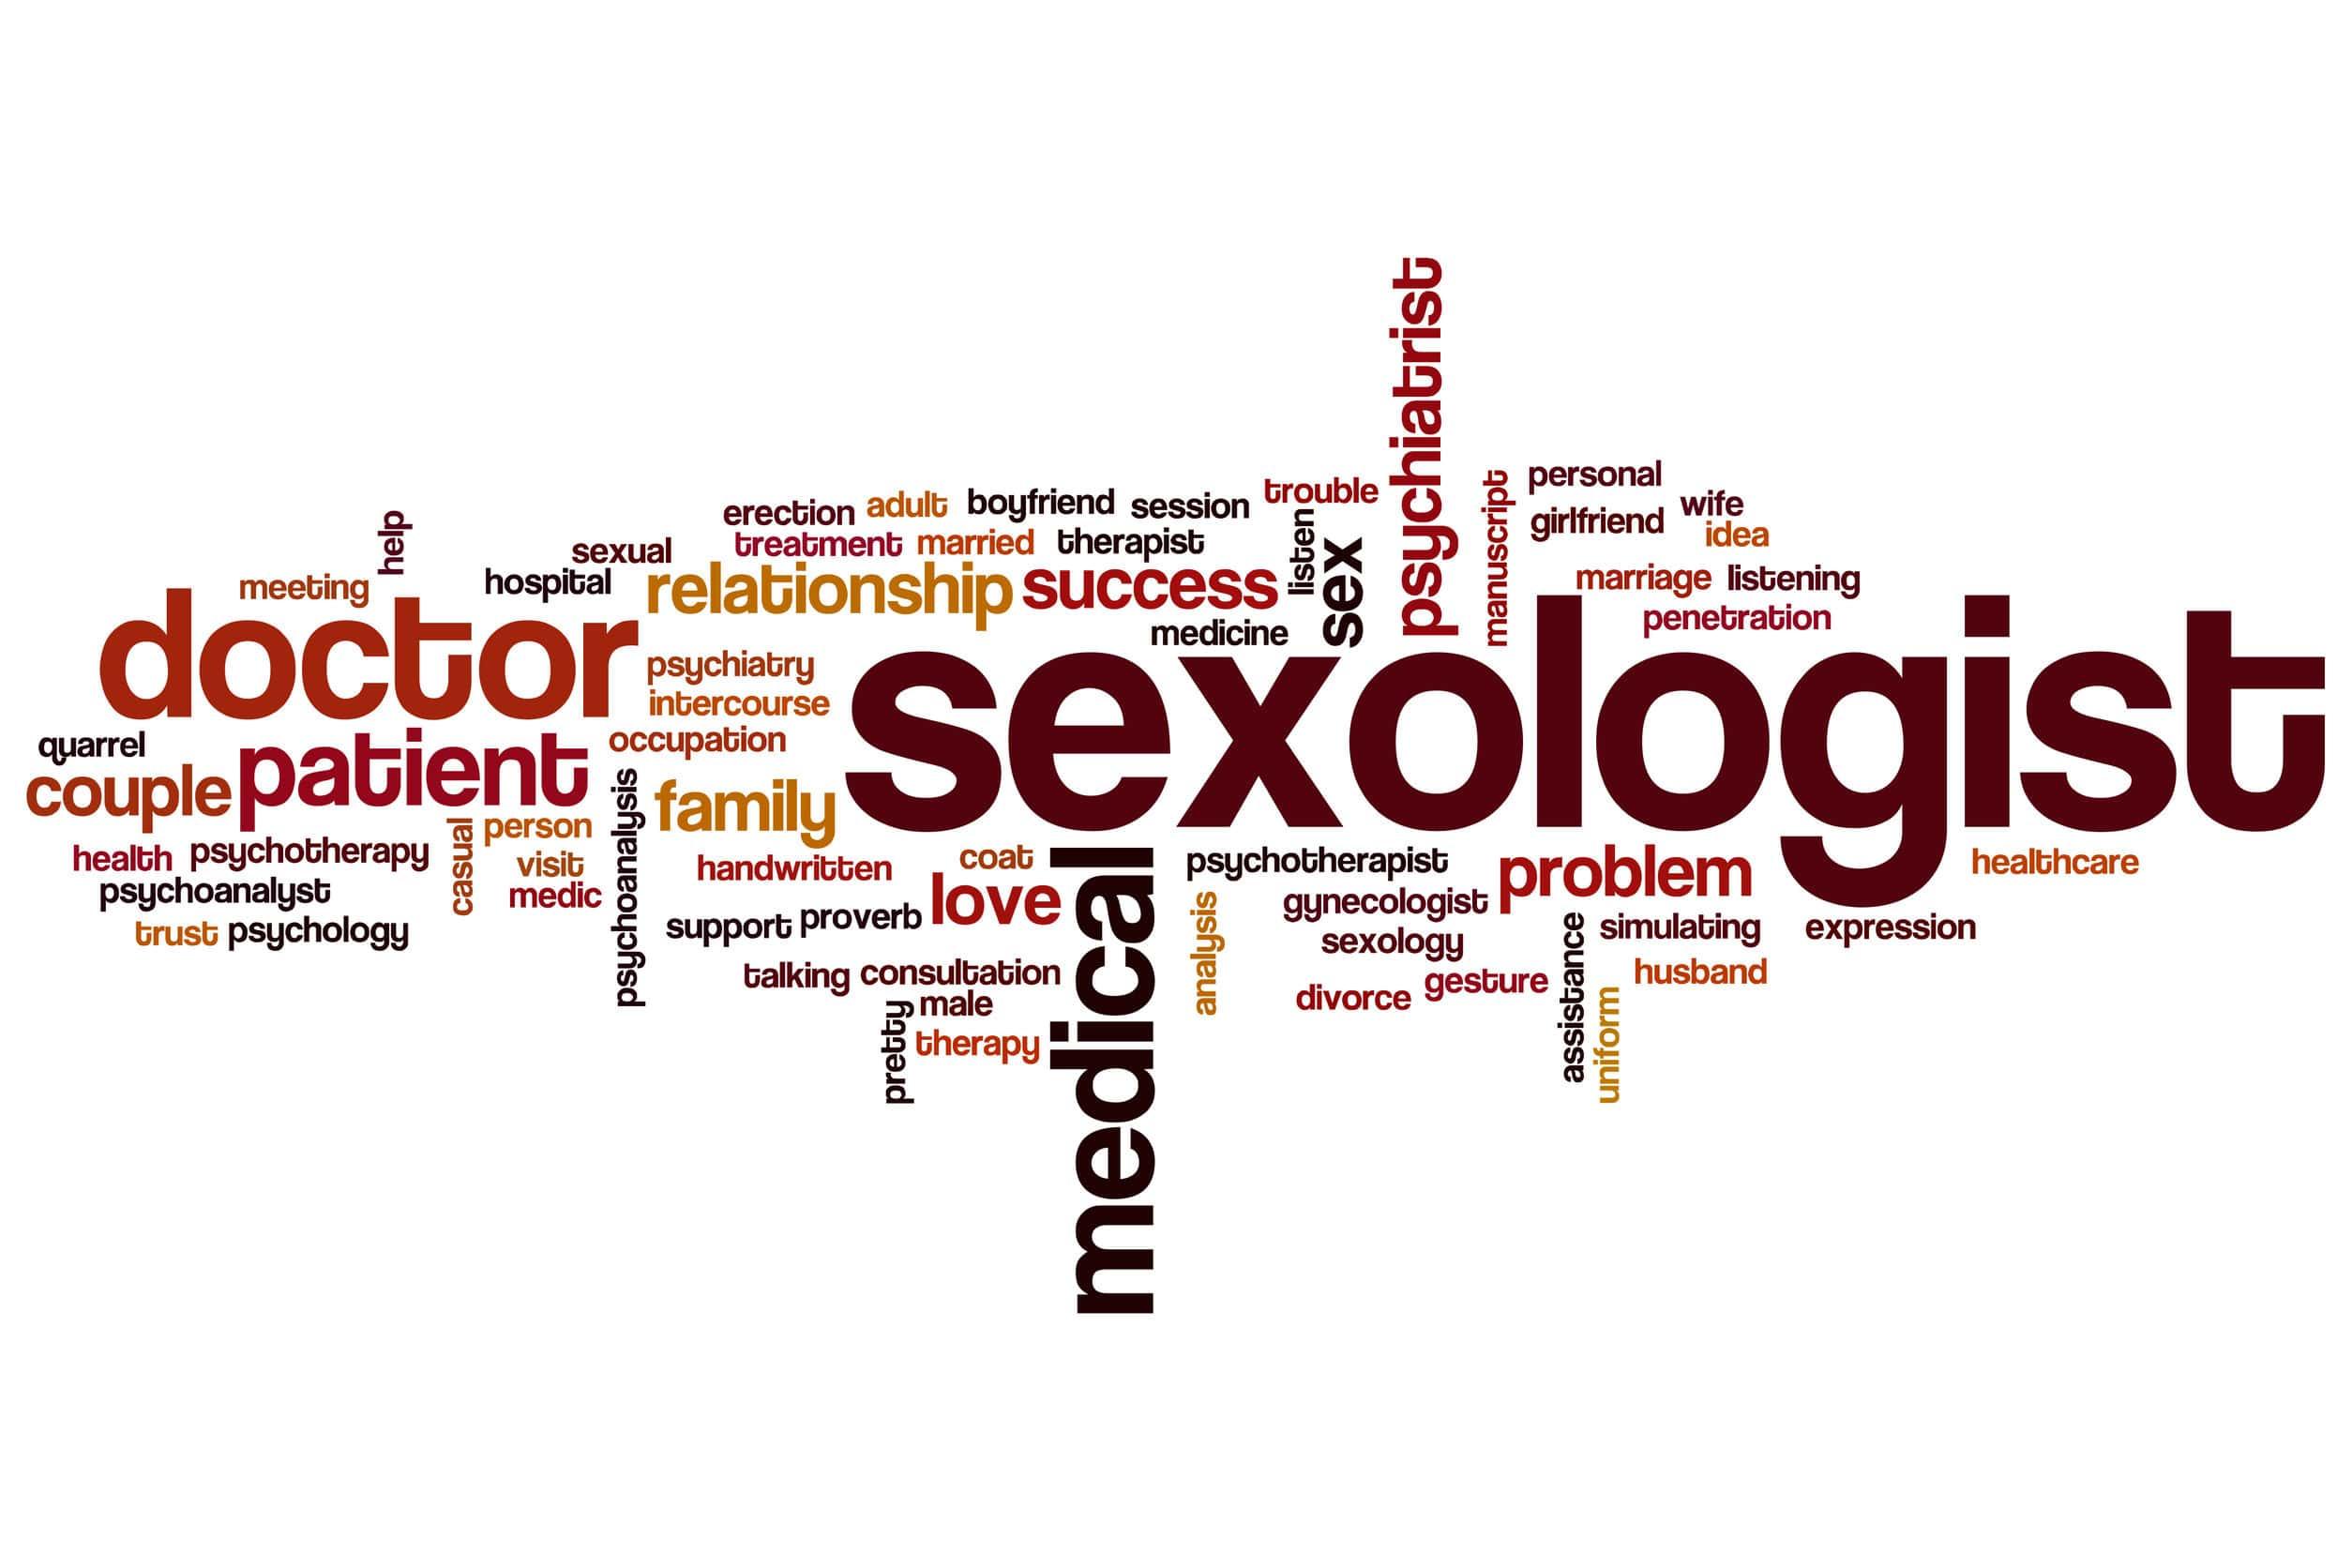 Sexologists